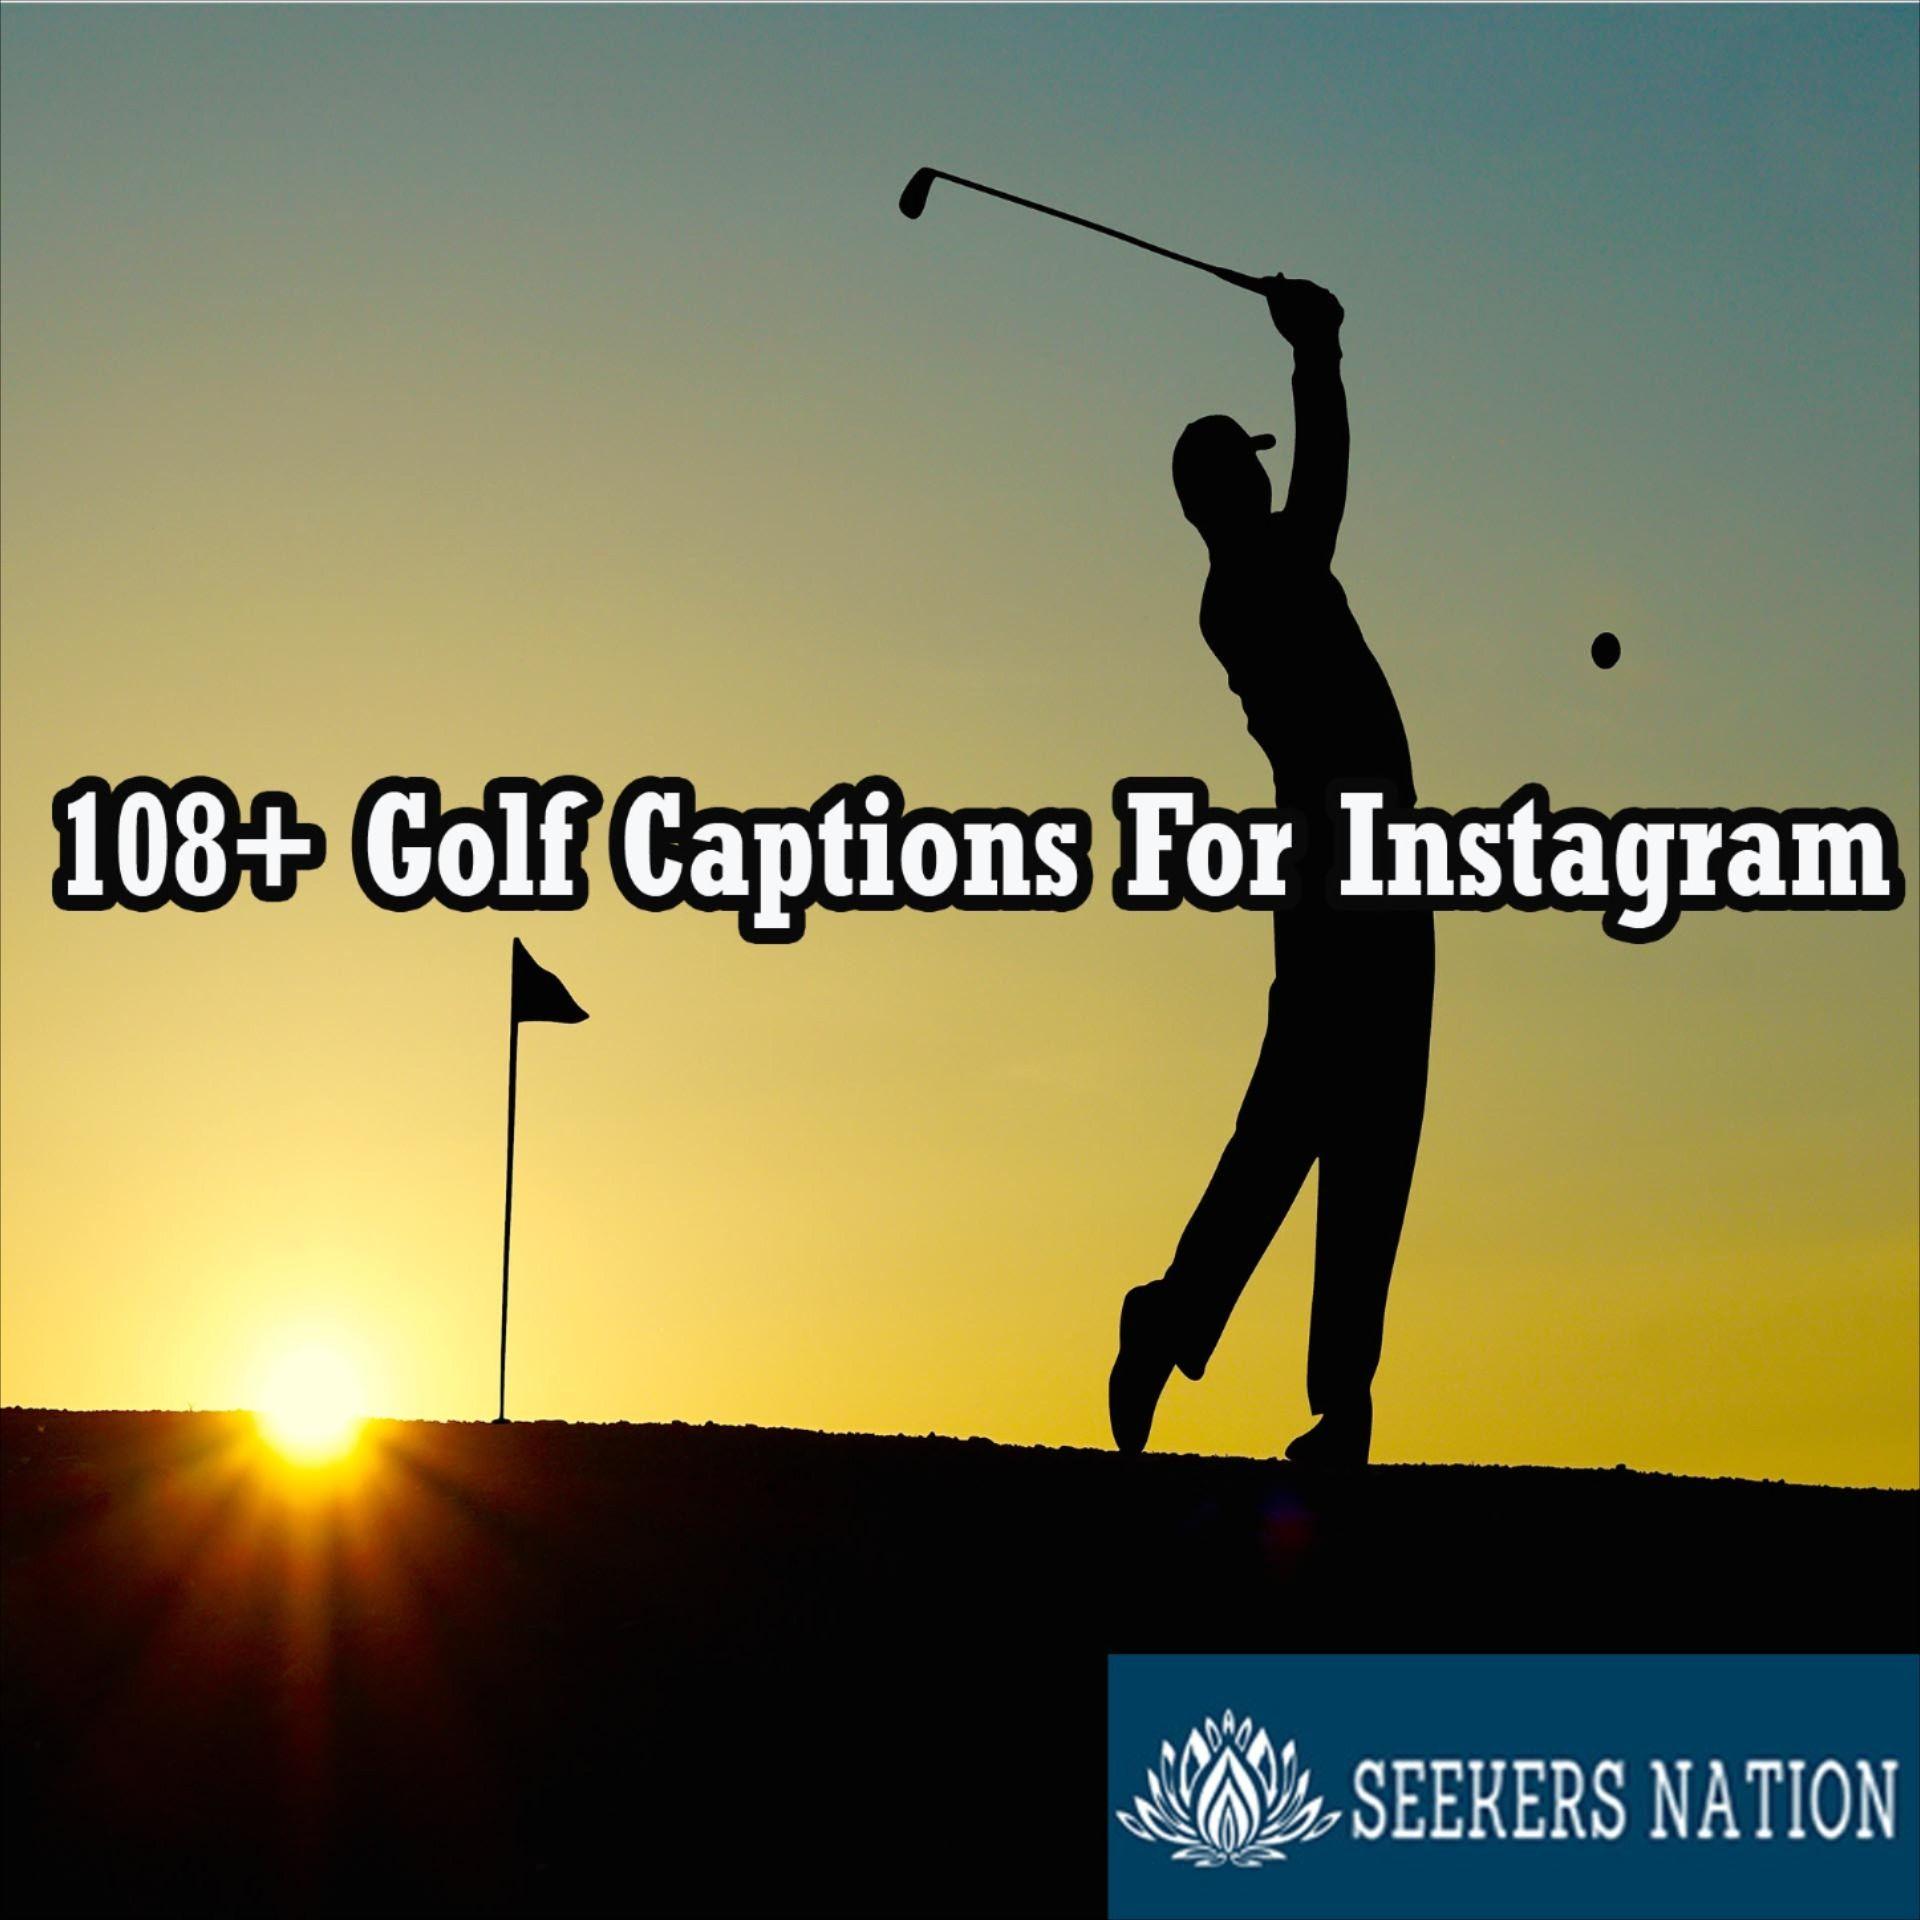 80 Golf Captions For Instagram Posts In 2021 Instagram Captions Captions For Instagram Posts Instagram